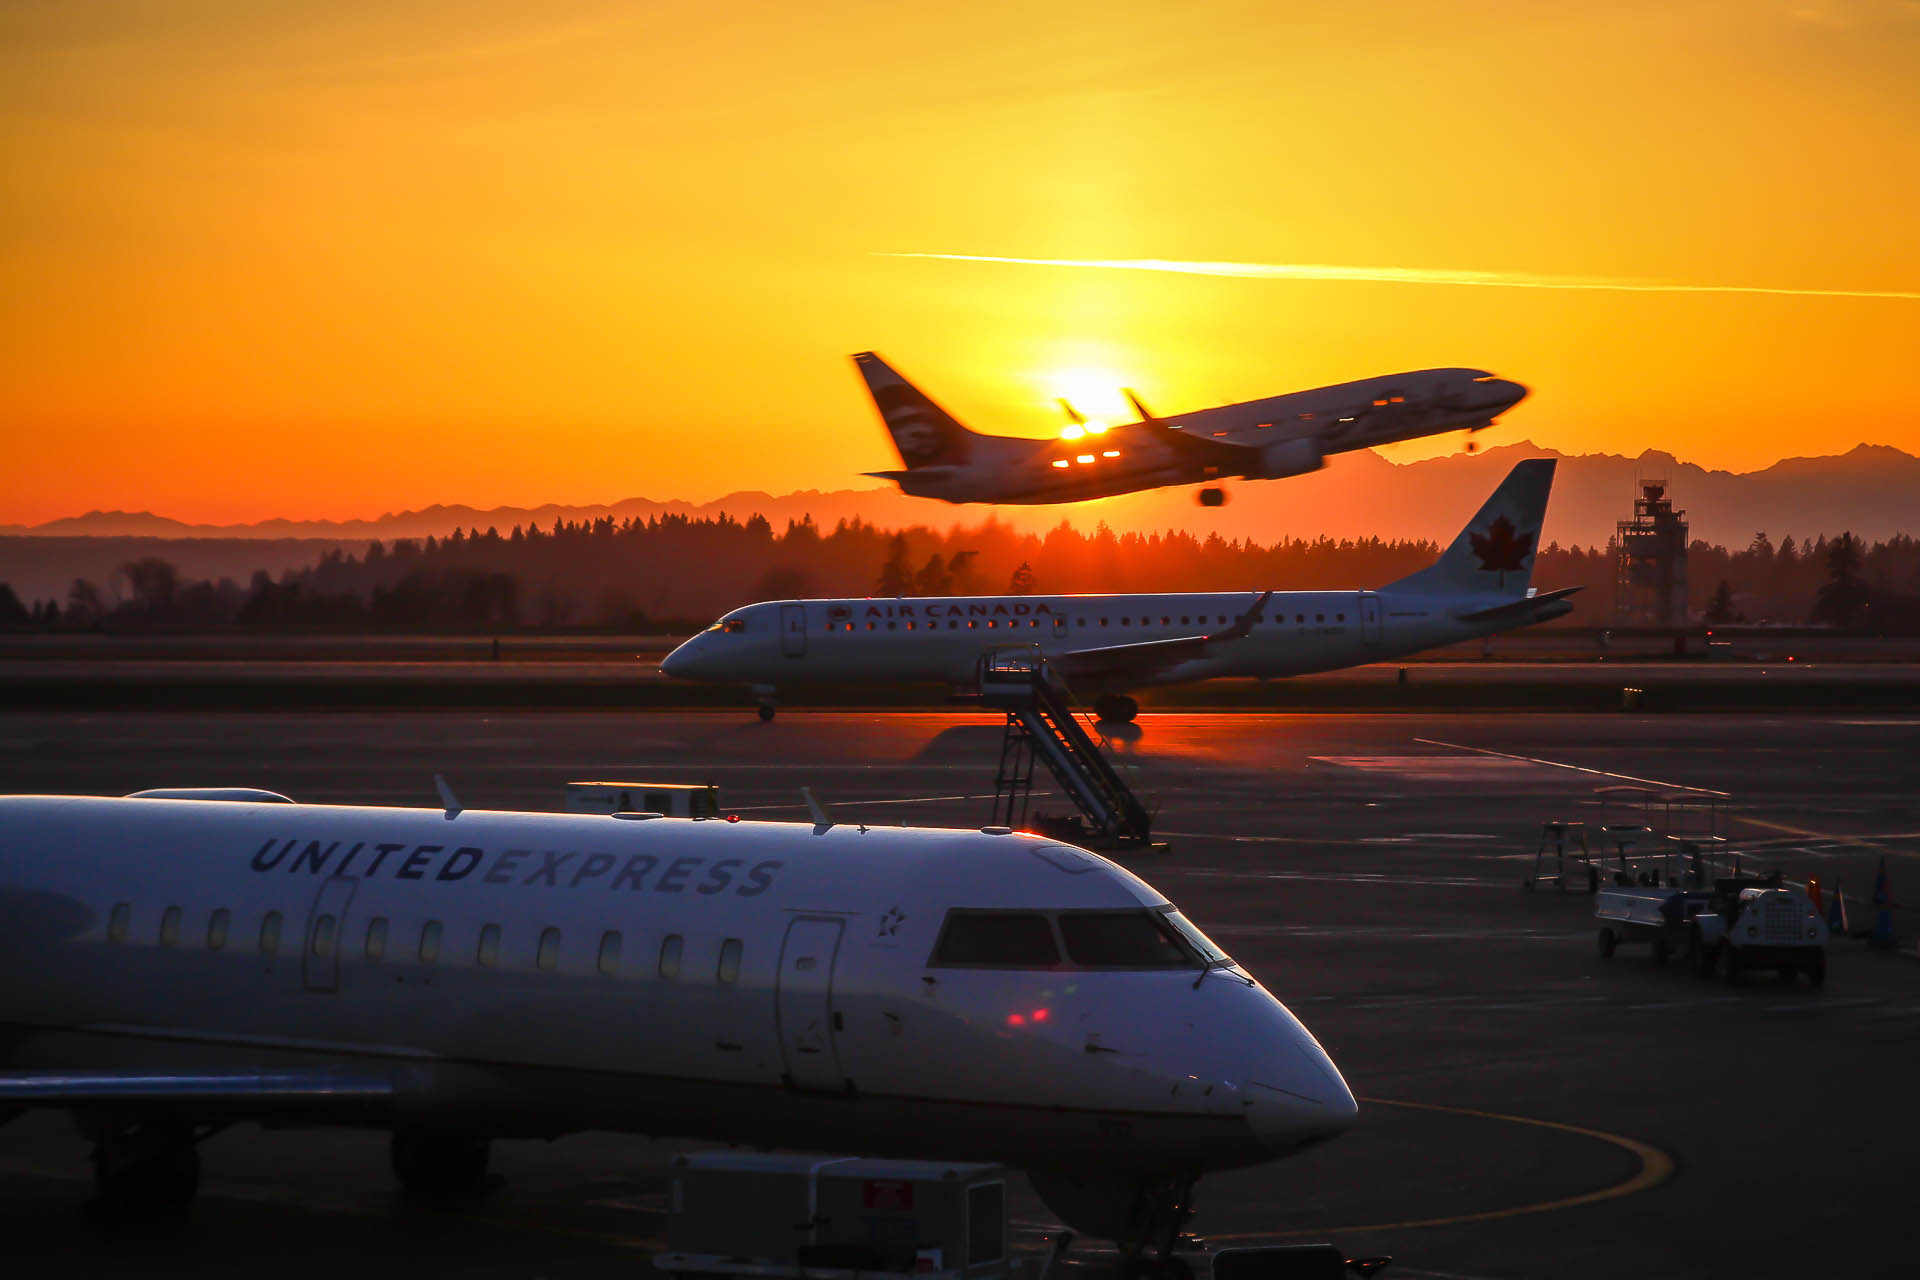 Alaska Airlines 737 Takeoff Sunset